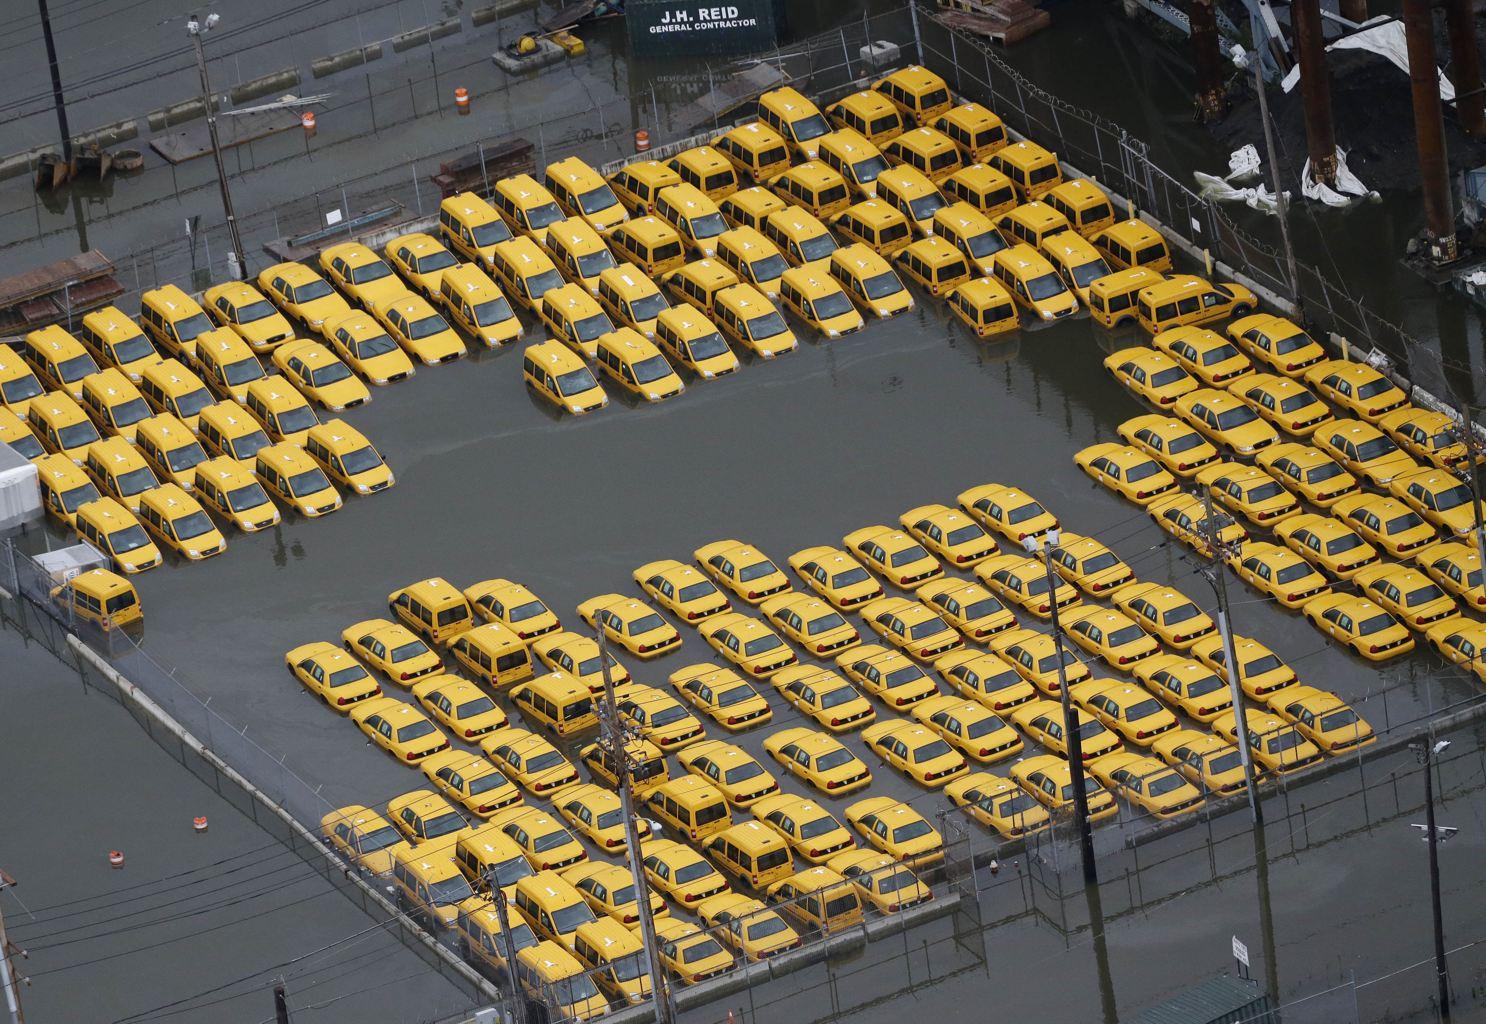 yellow cab flood